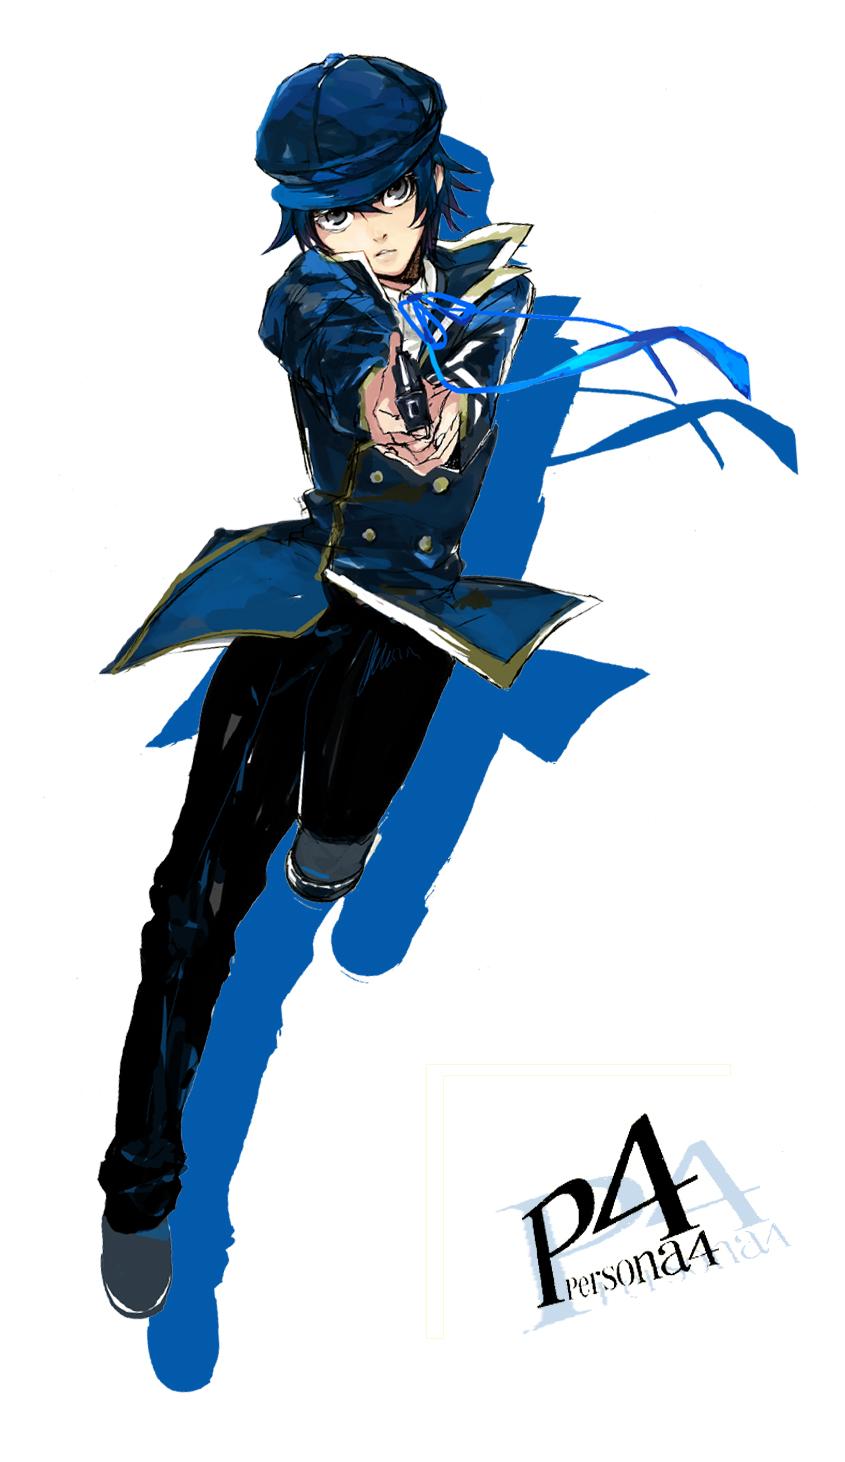 Persona 4 Anime Characters : Shirogane naoto  zerochan